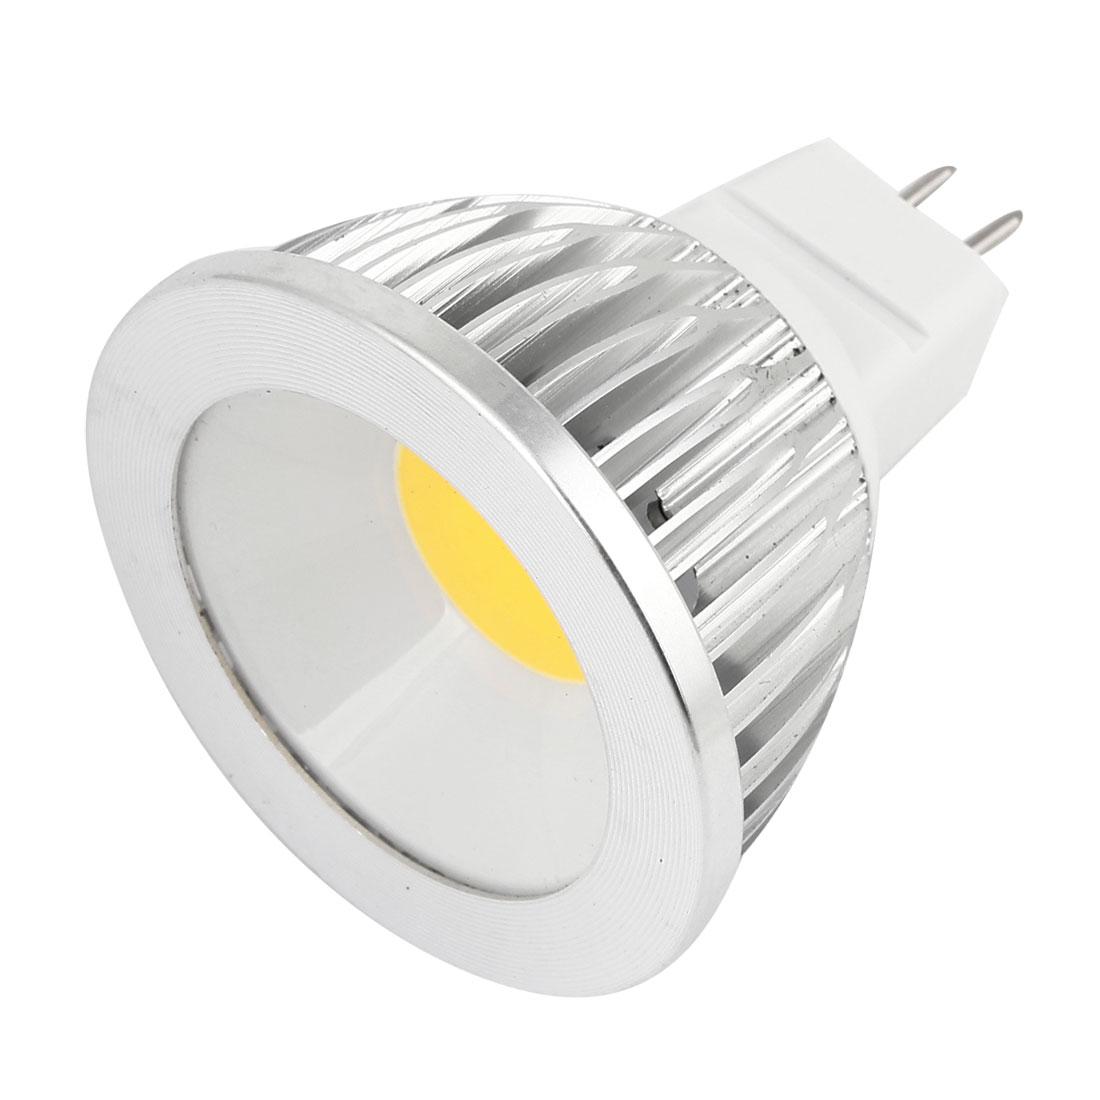 AC 12V 6W MR16 Non-dimmable Warm White Light COB LED Downlight Spotlight